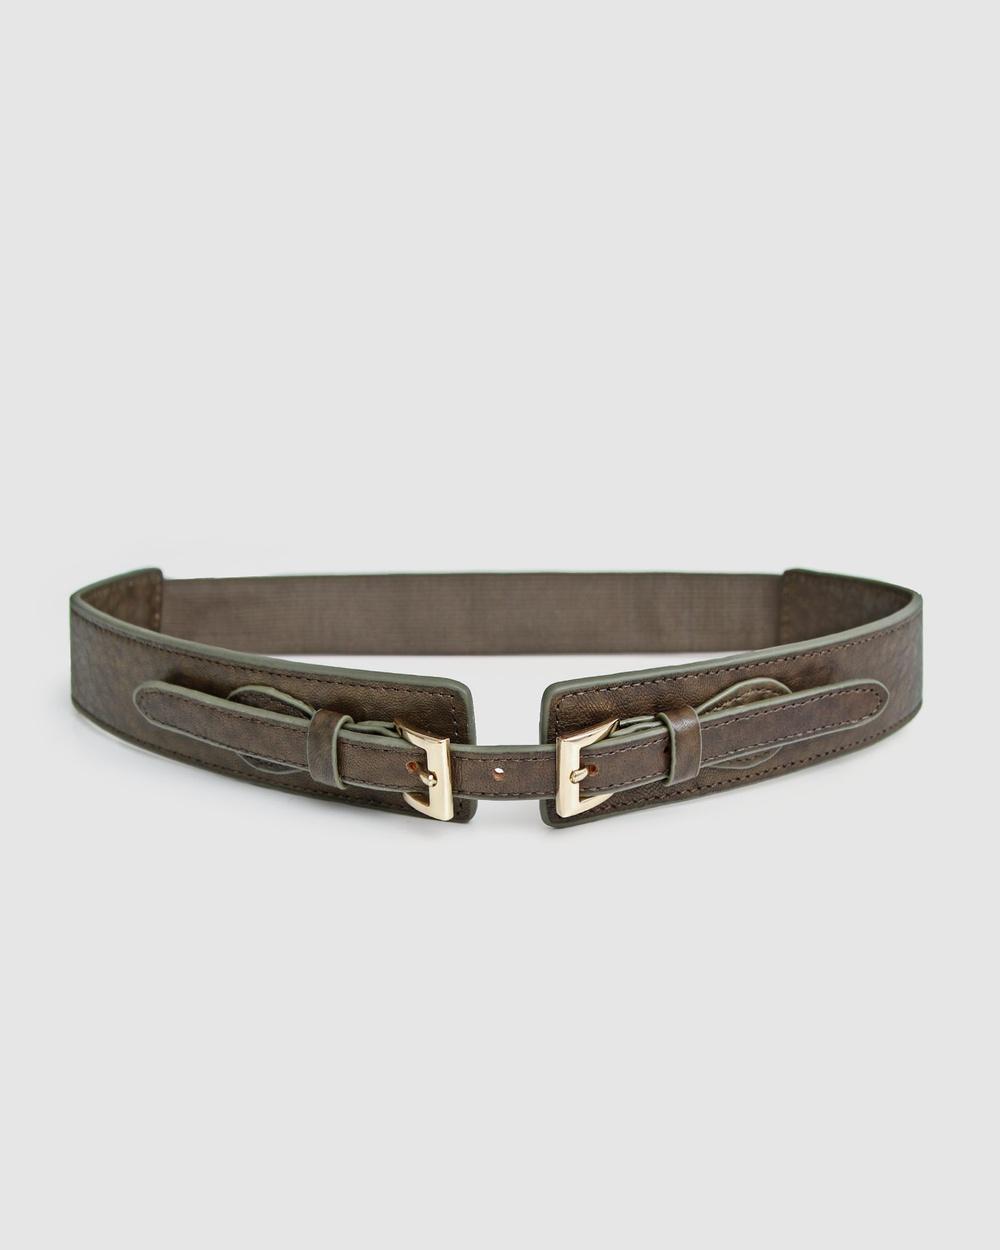 Belle & Bloom London Fog Leather Waist Belt Belts Military